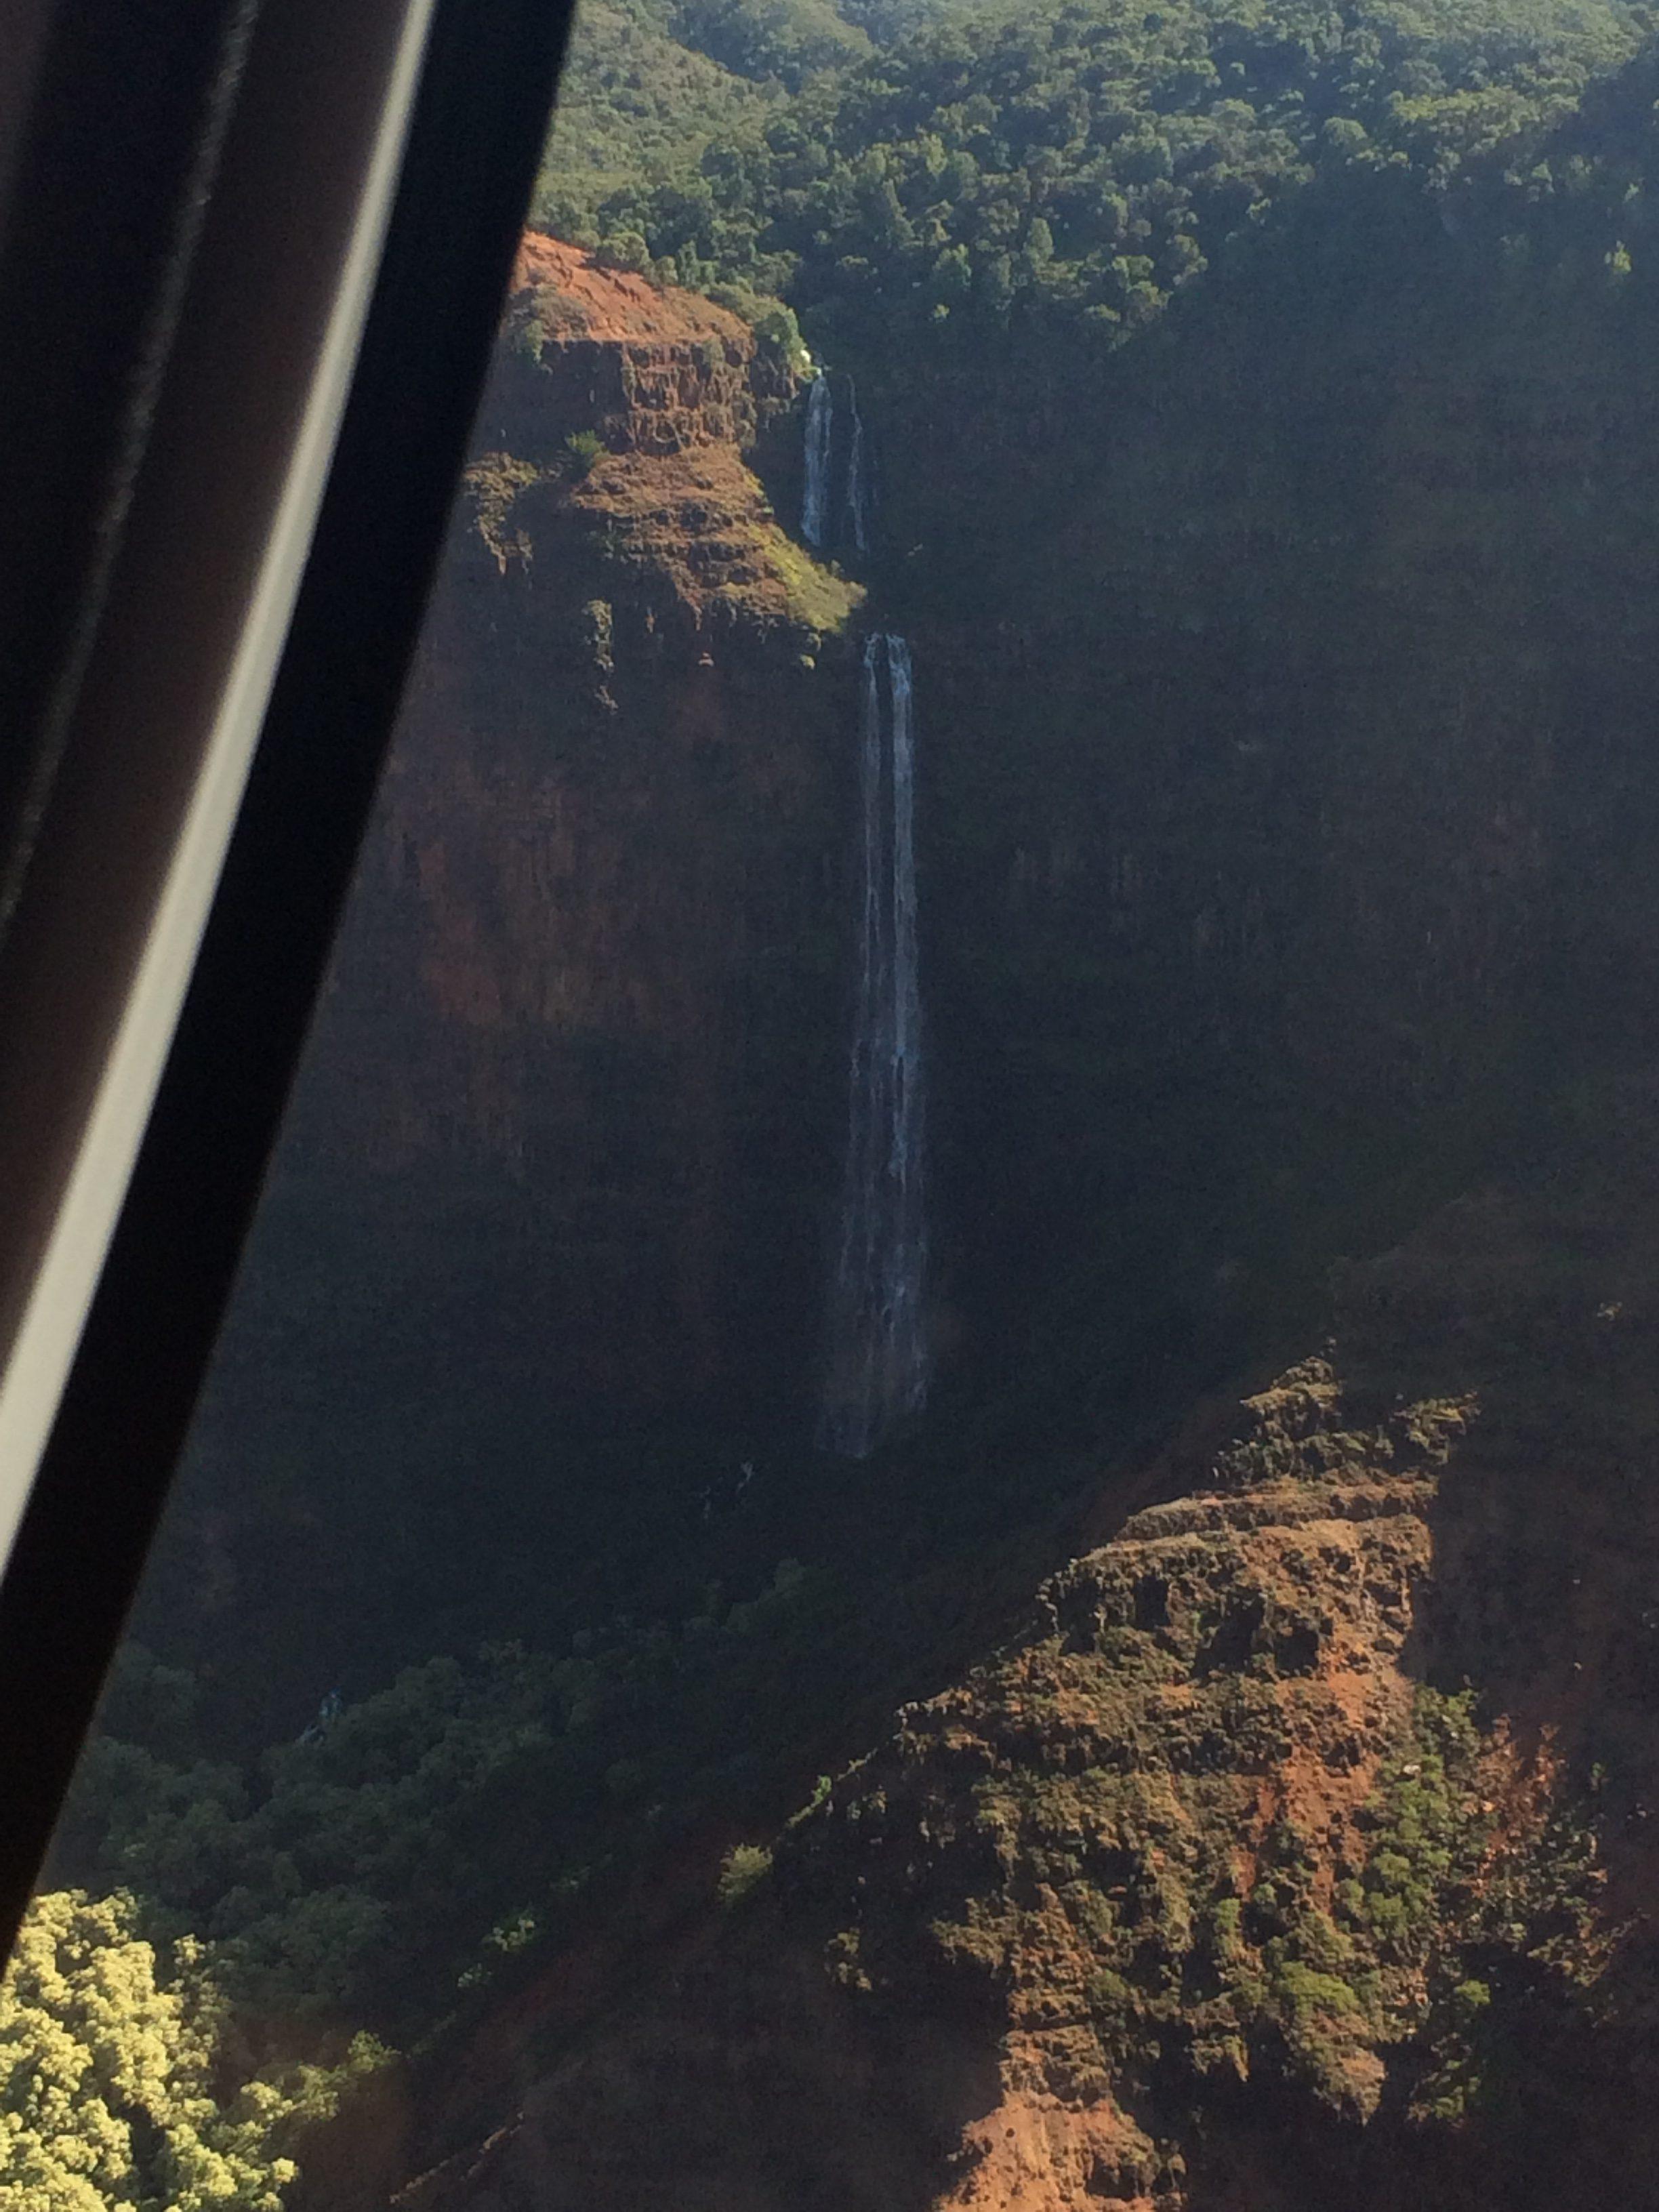 Kauai Hawaii Anniversary vacation Blue Hawaiian Helicopter Tour